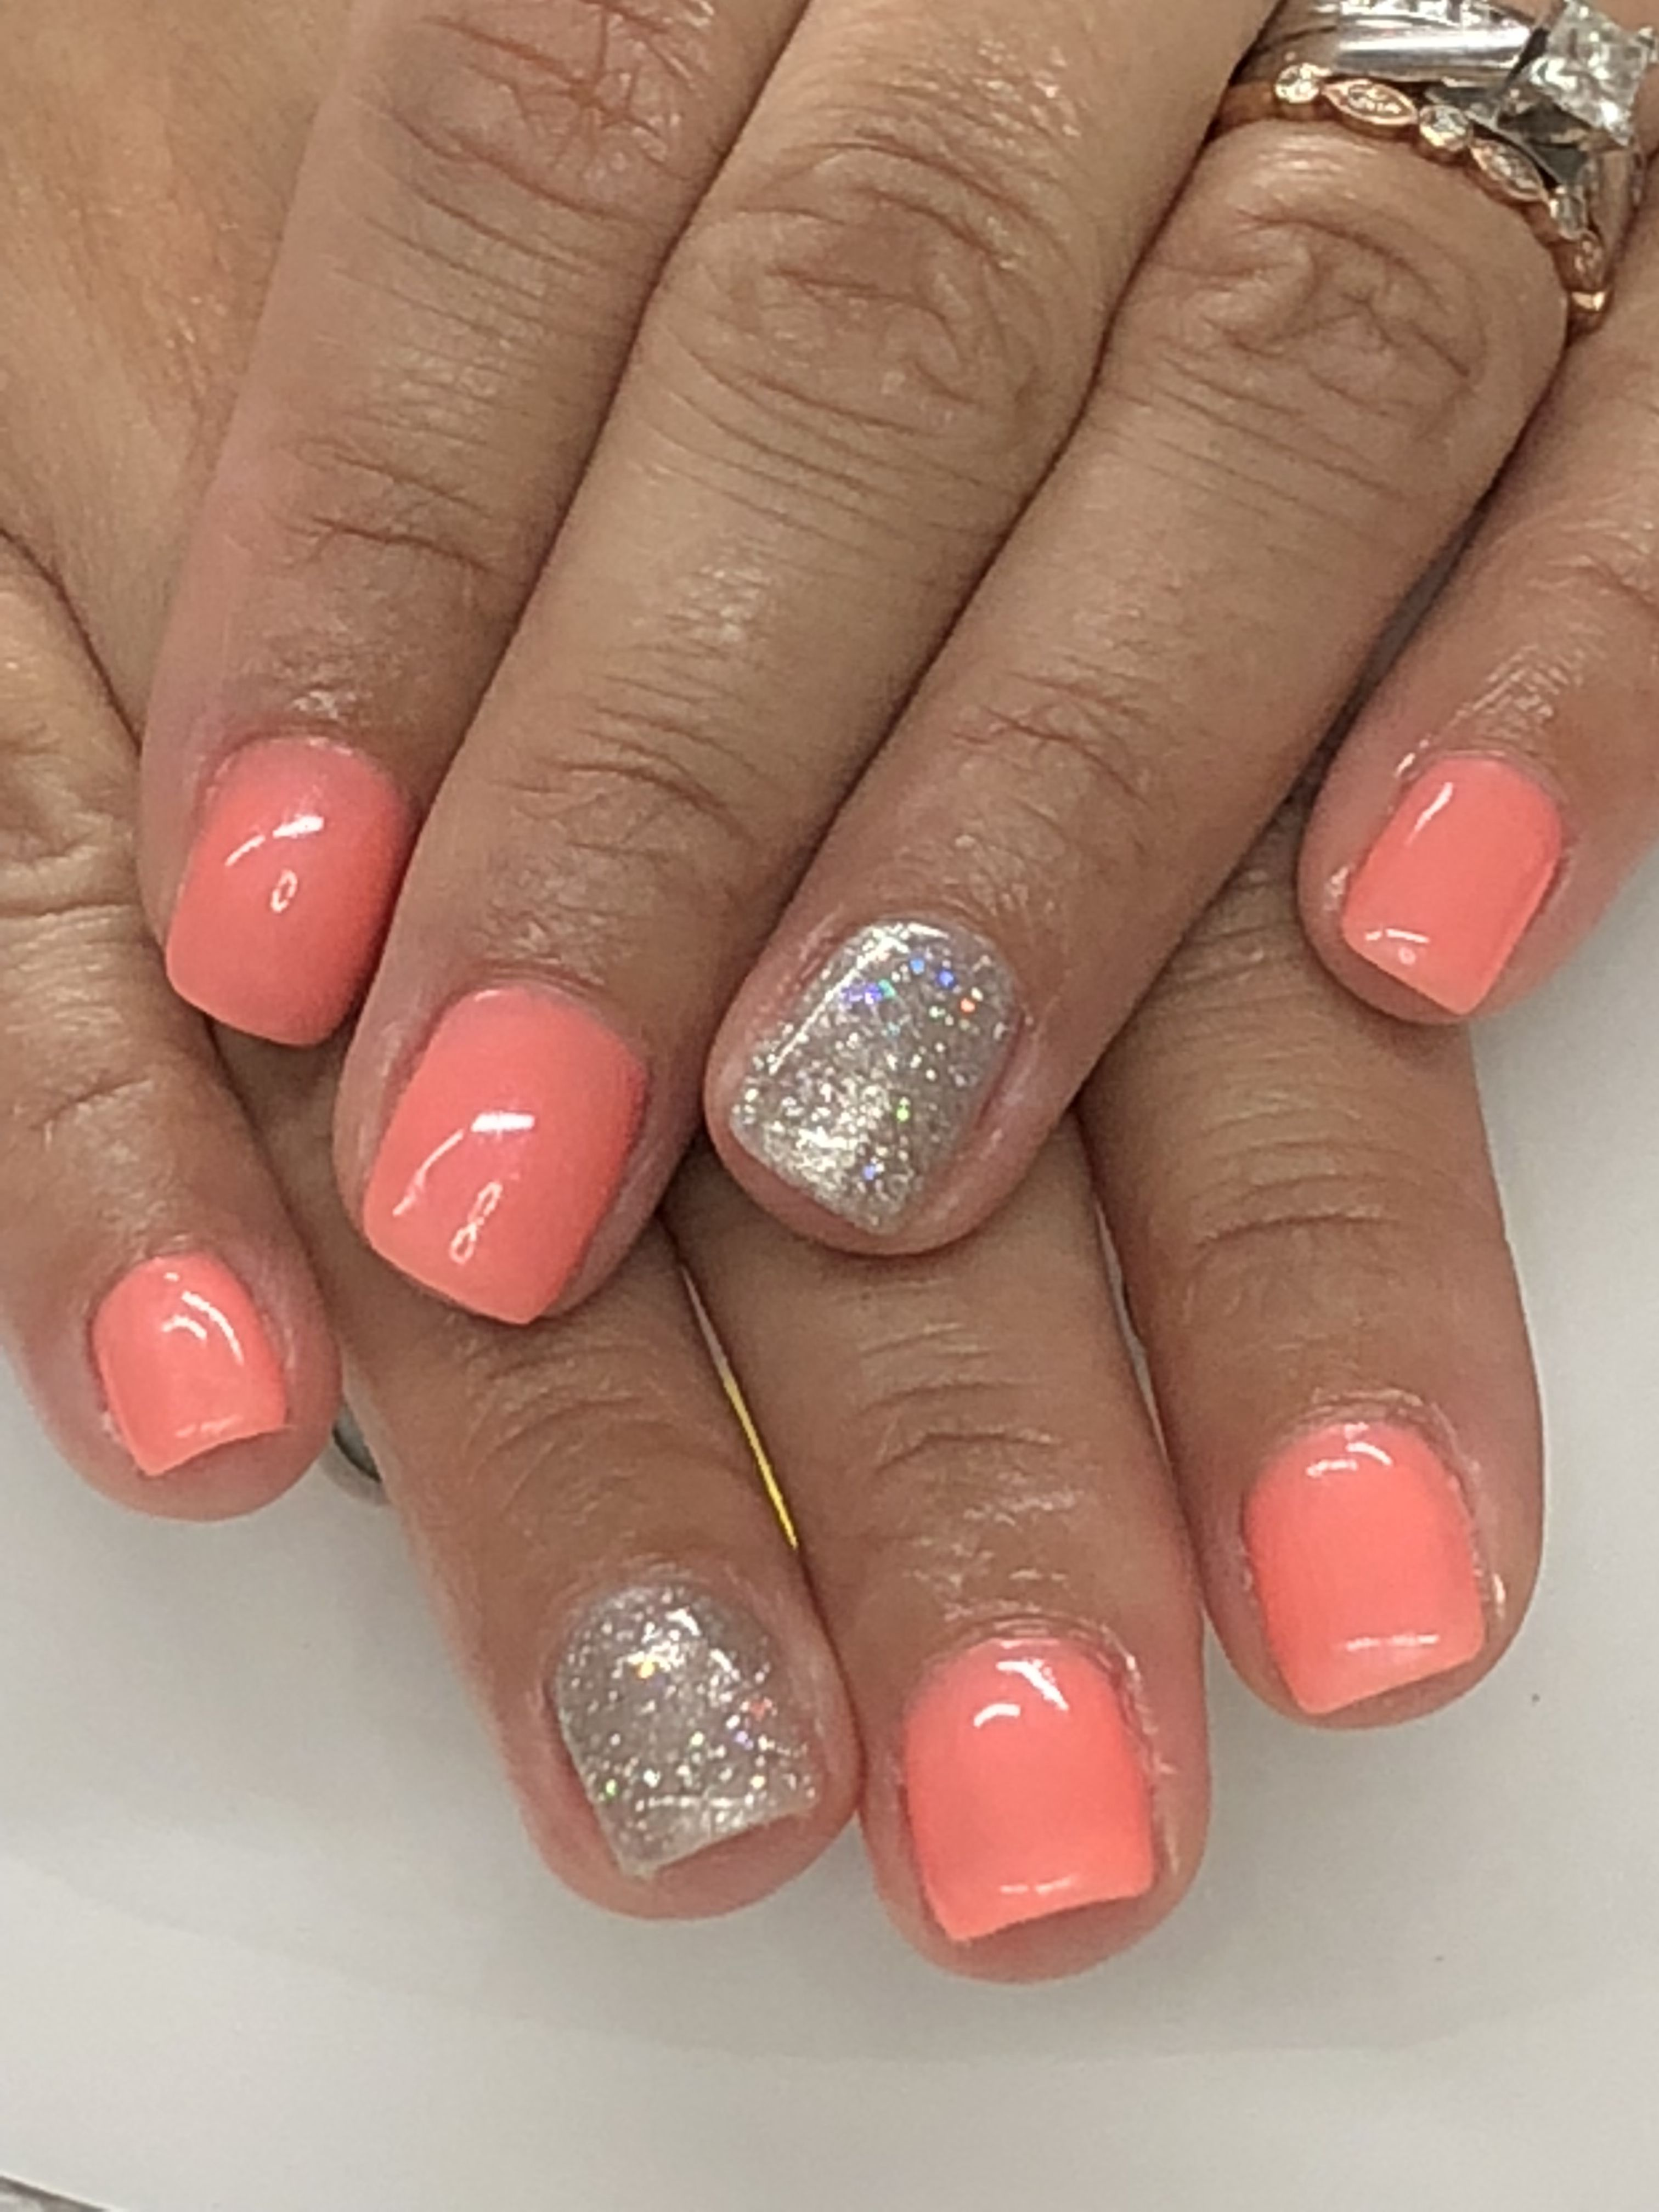 Summer Coral Nails With Images Coral Nails Gel Nail Designs